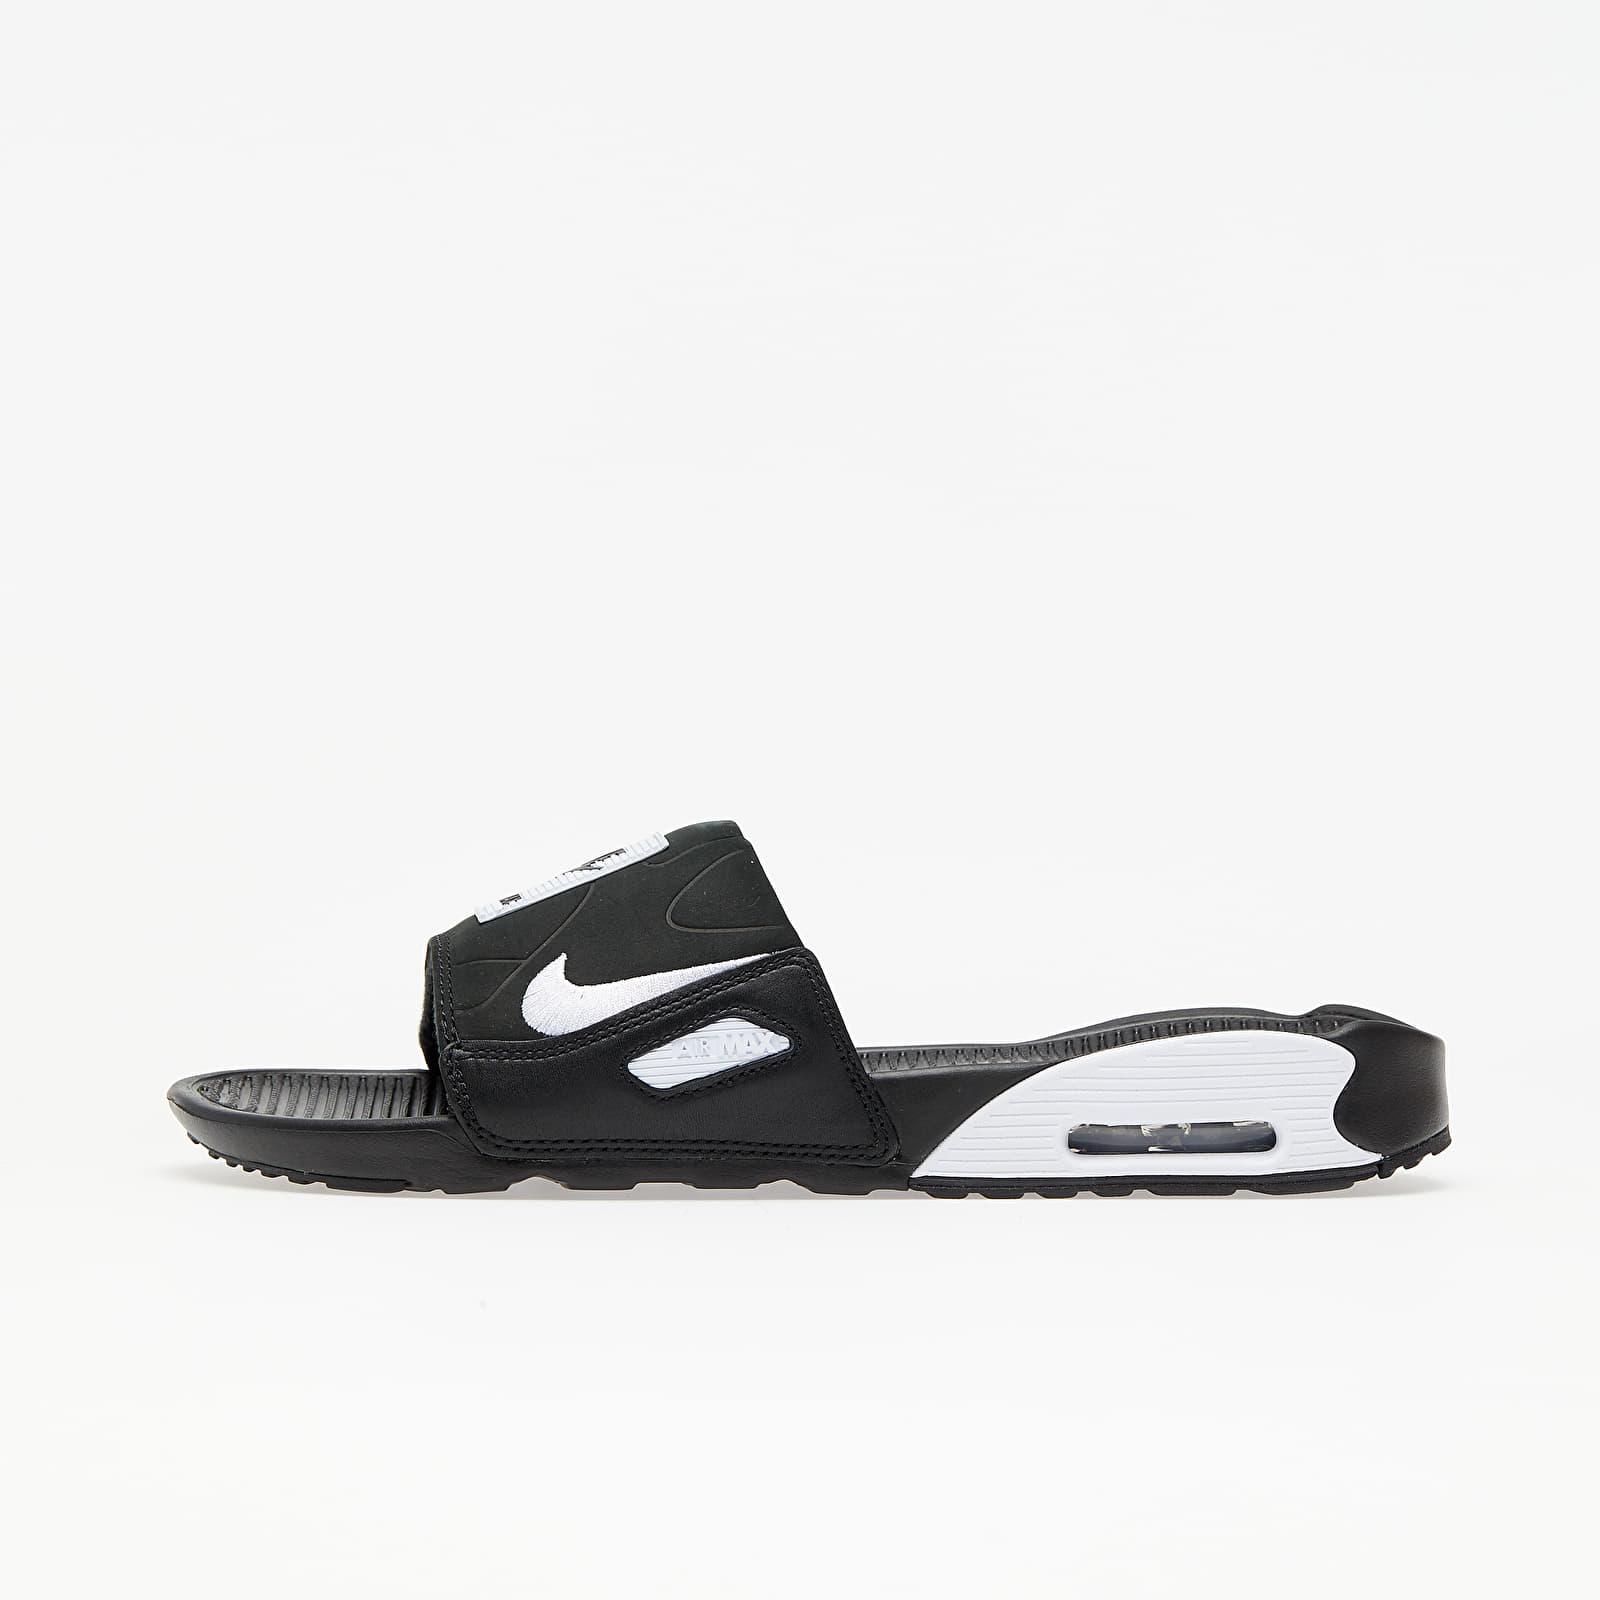 Nike Air Max 90 Slide Black/ White BQ4635-002